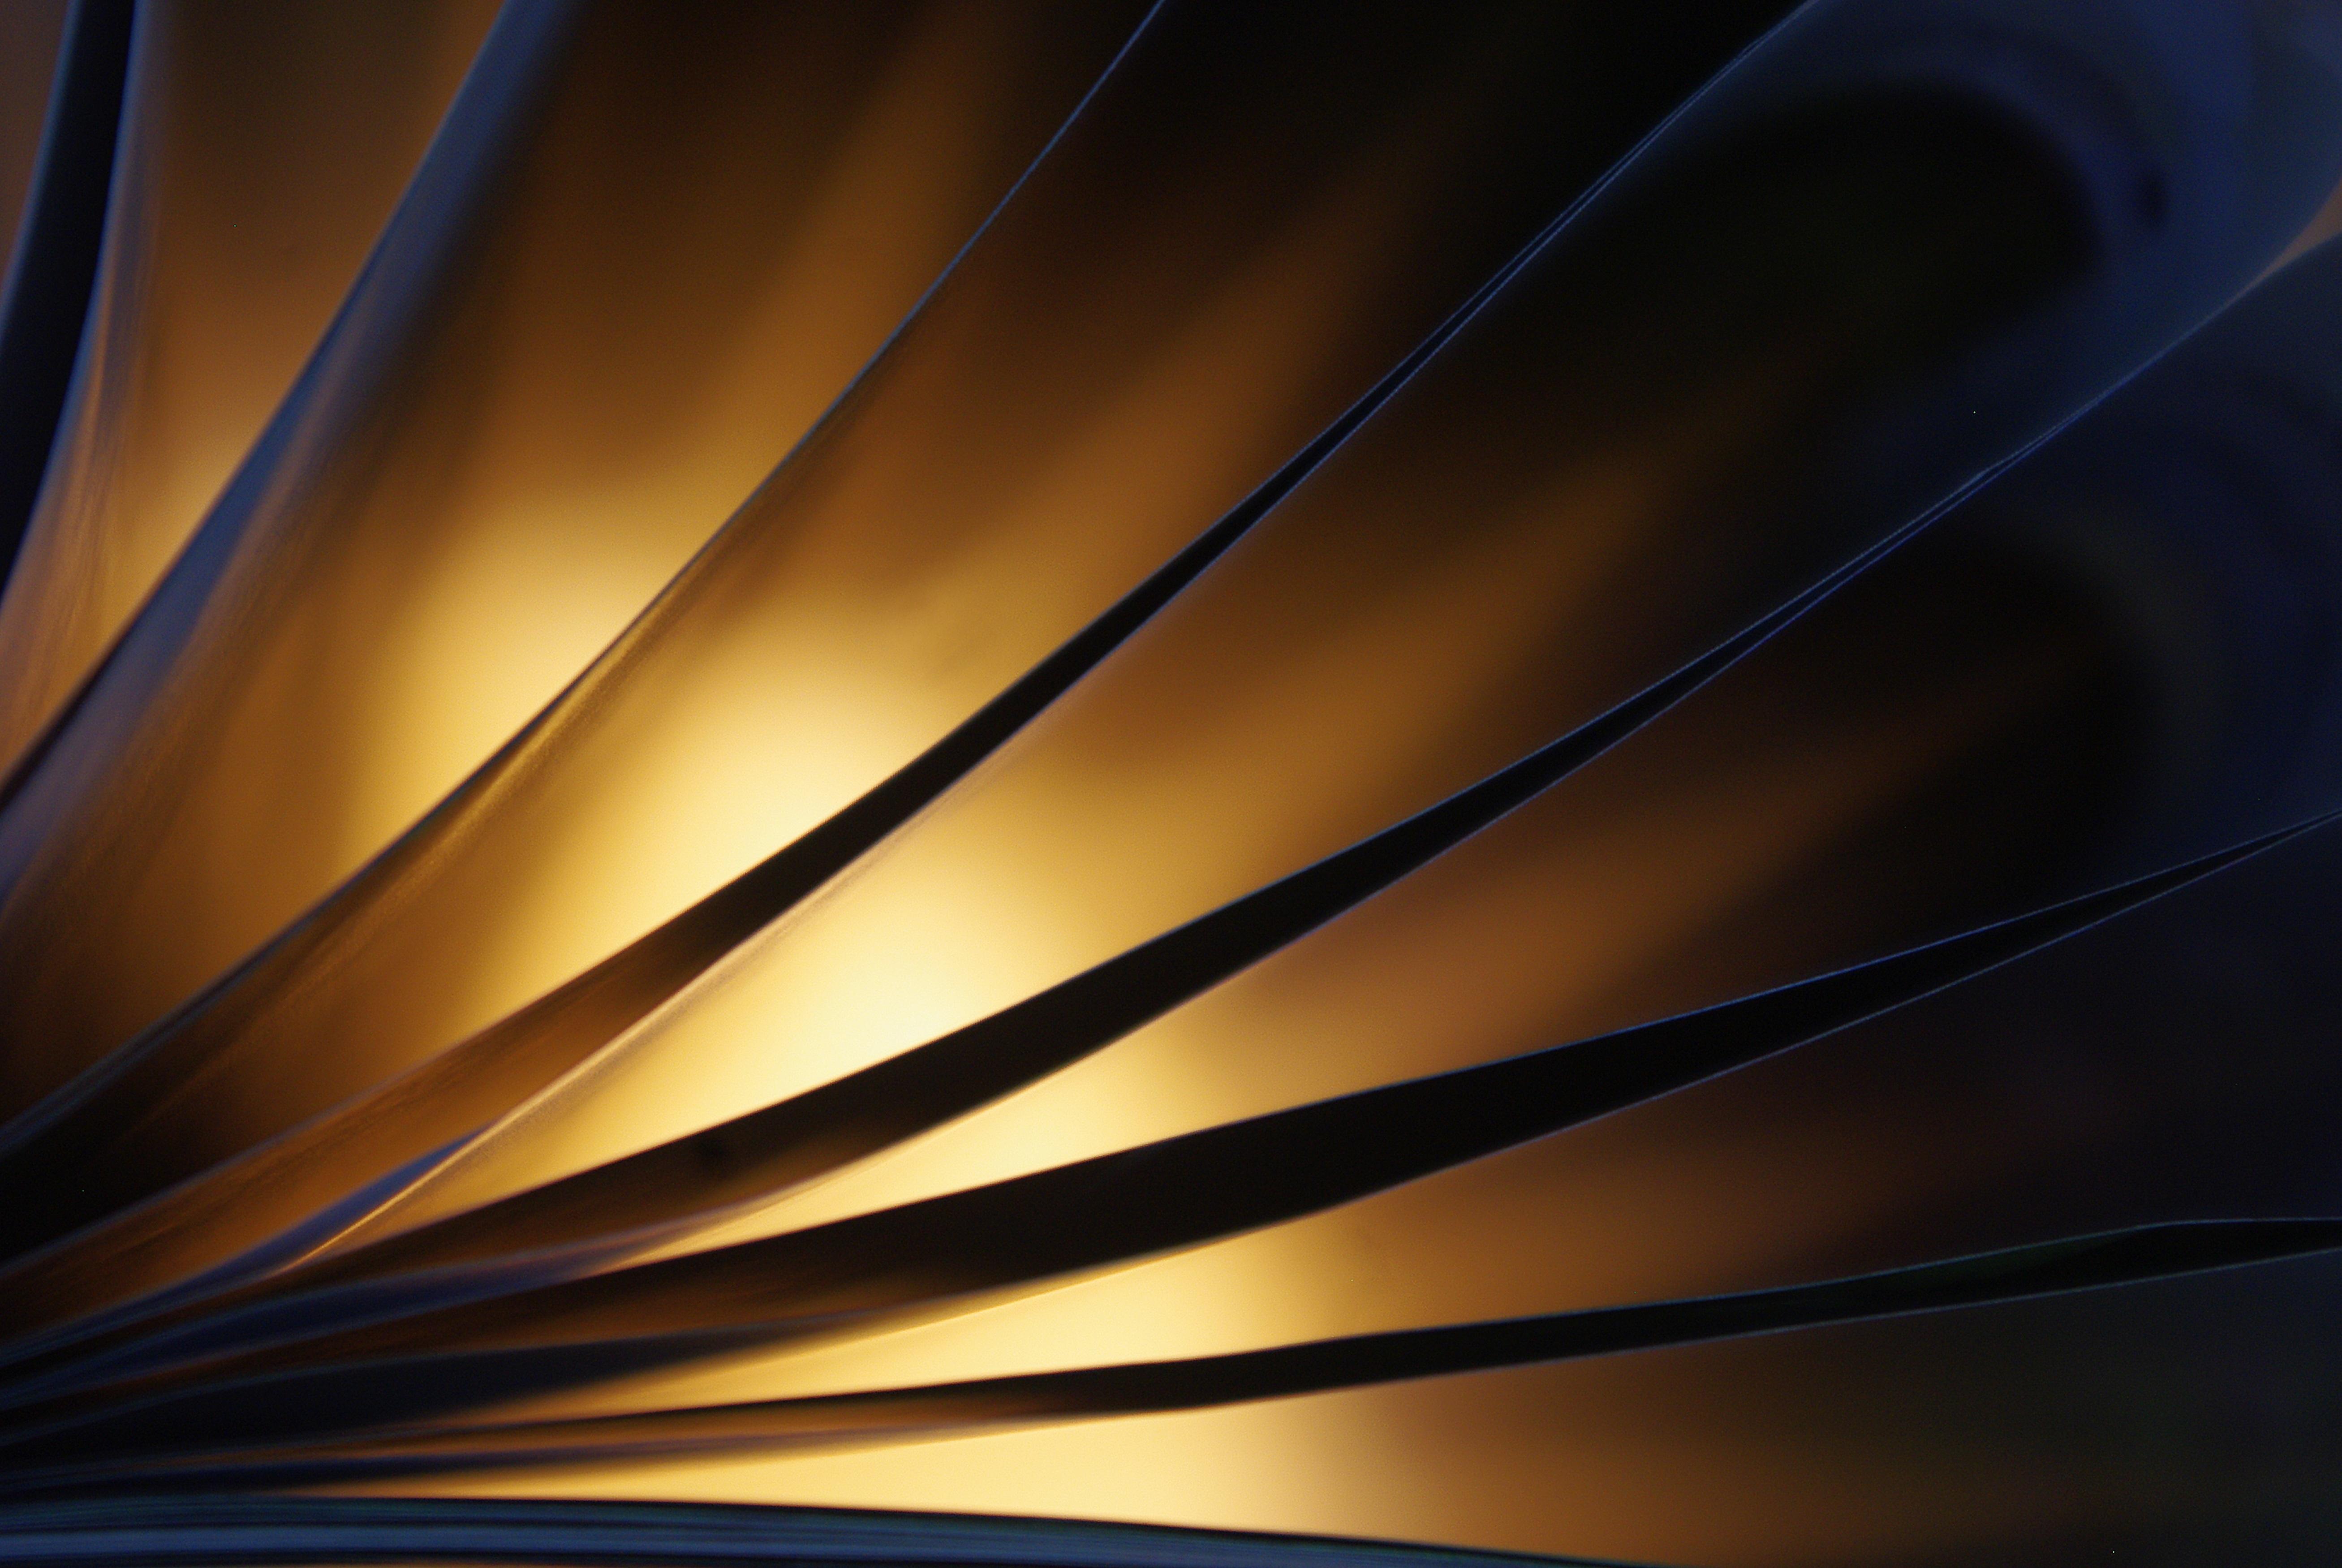 Leaf Texture, Design, Leaf, Light, Texture, HQ Photo